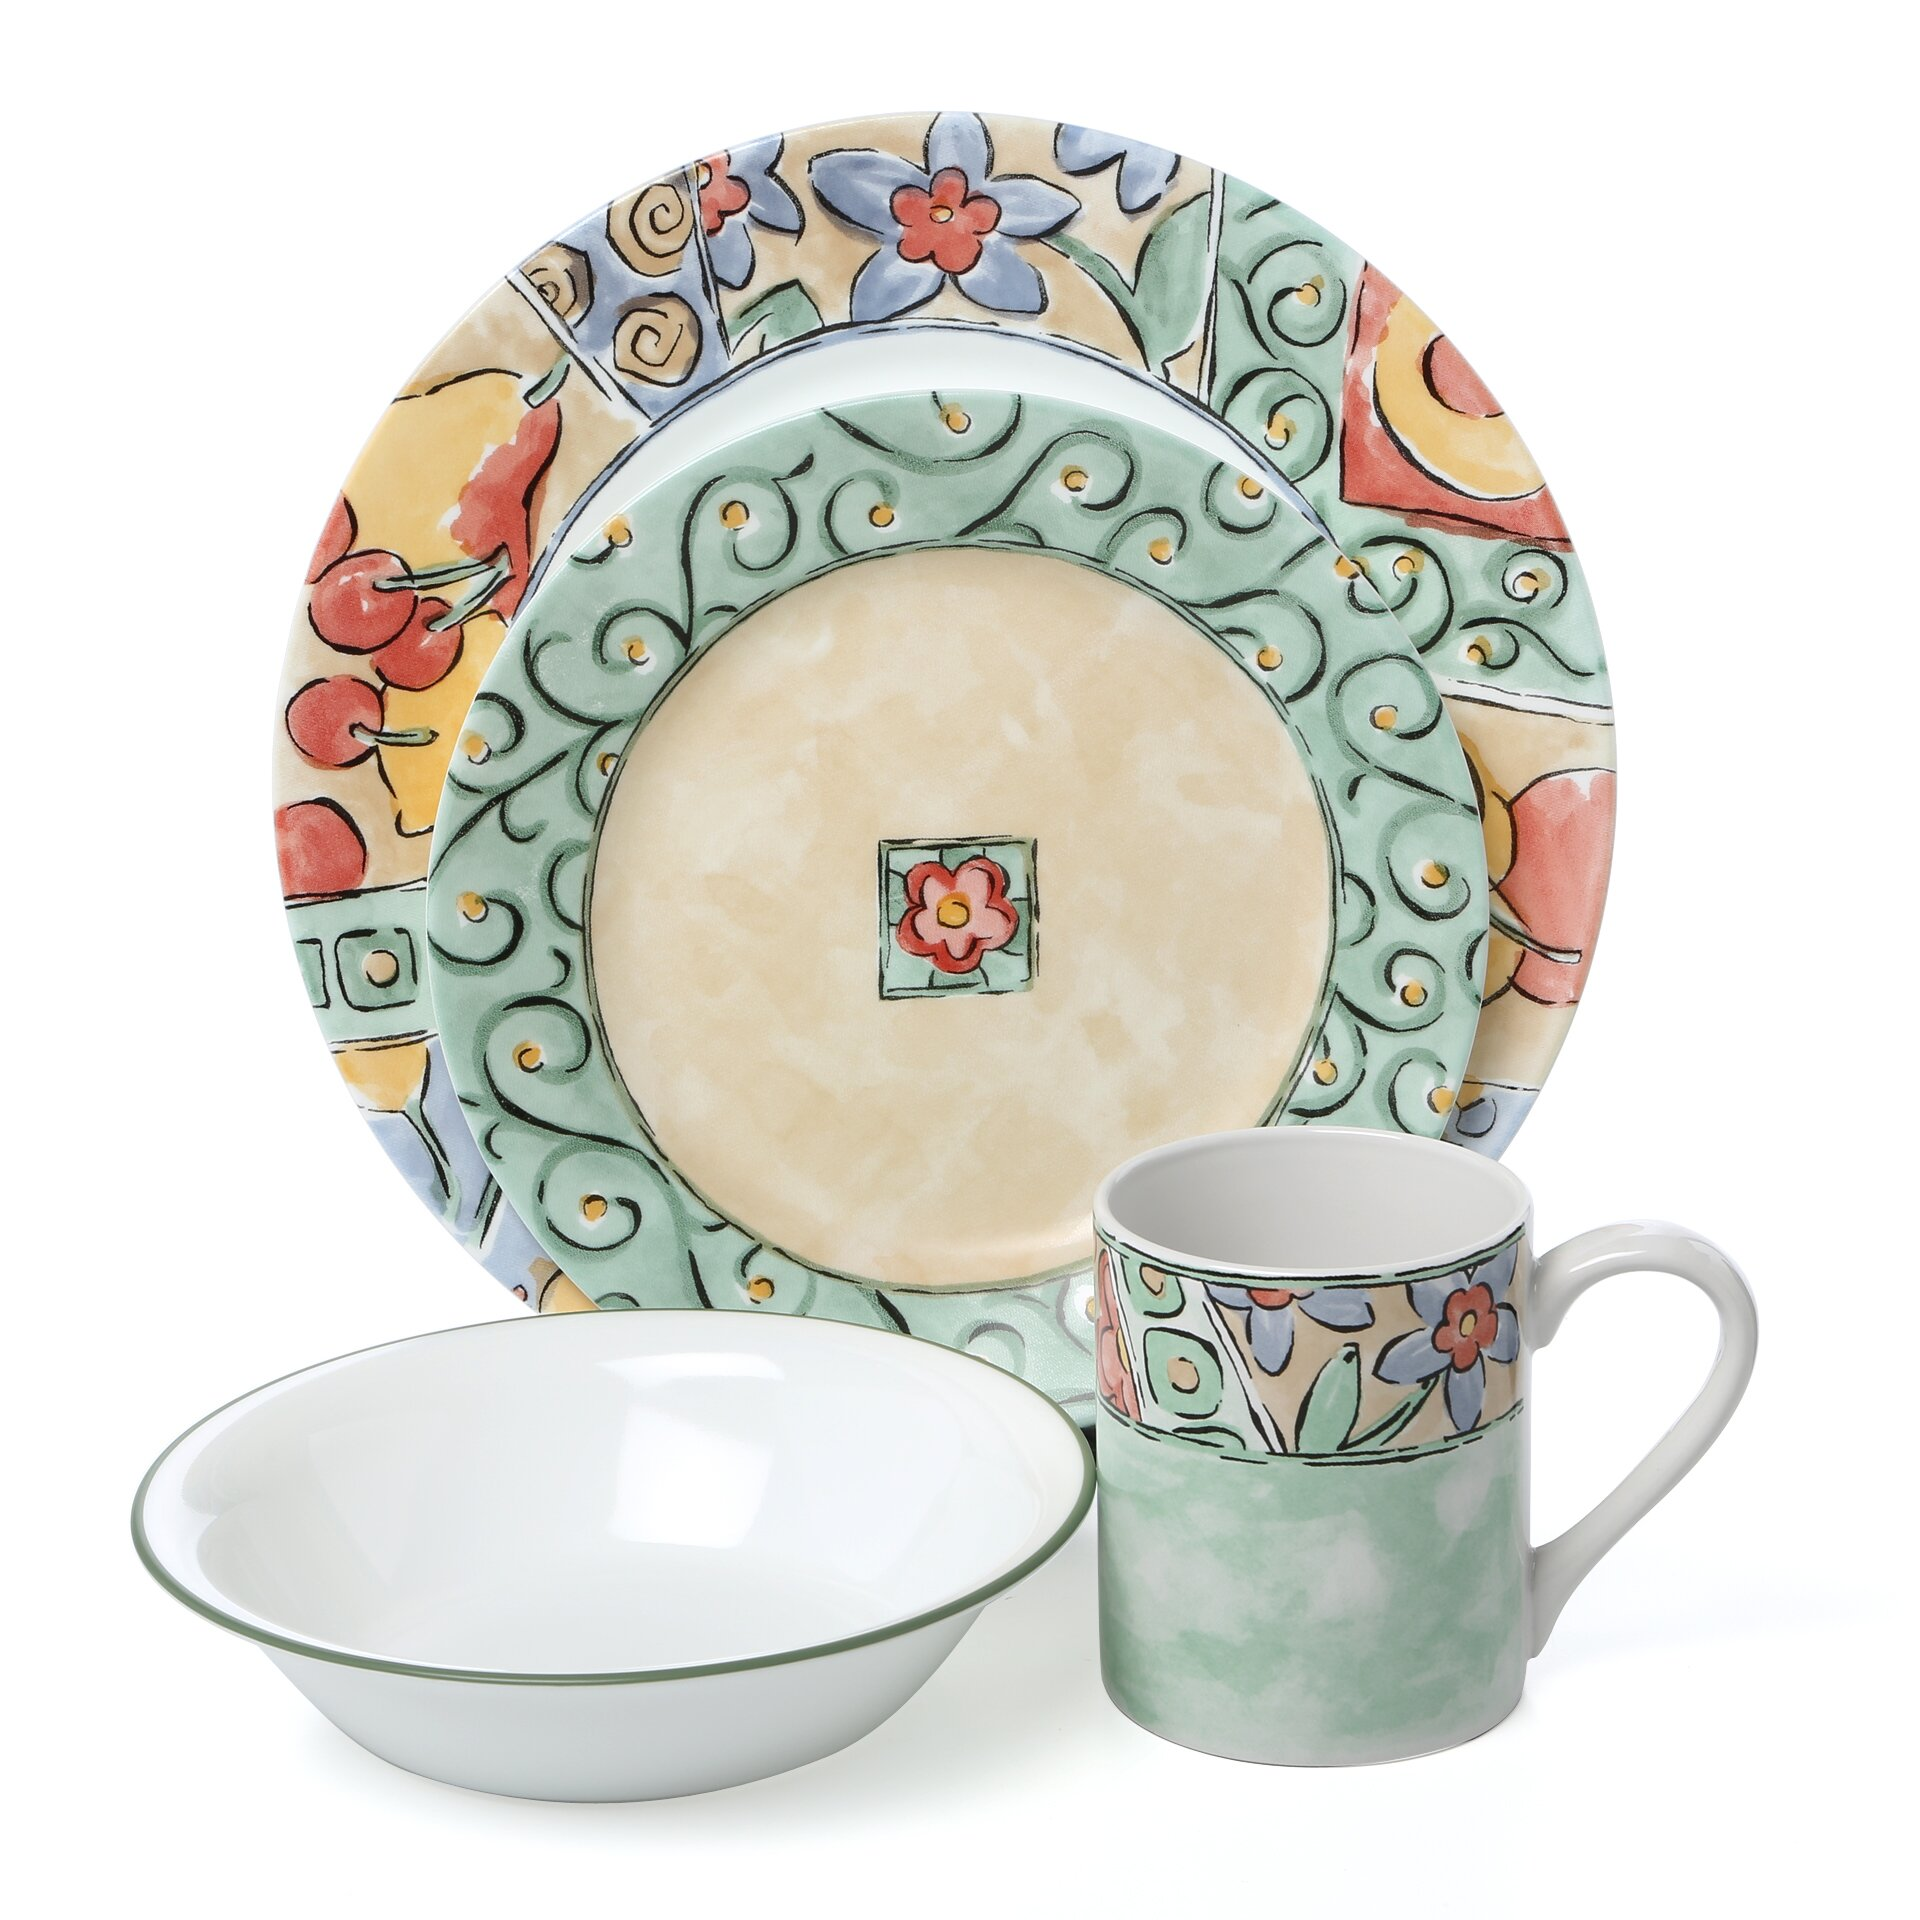 Corelle Impressions Watercolors 16 Piece Dinnerware Set